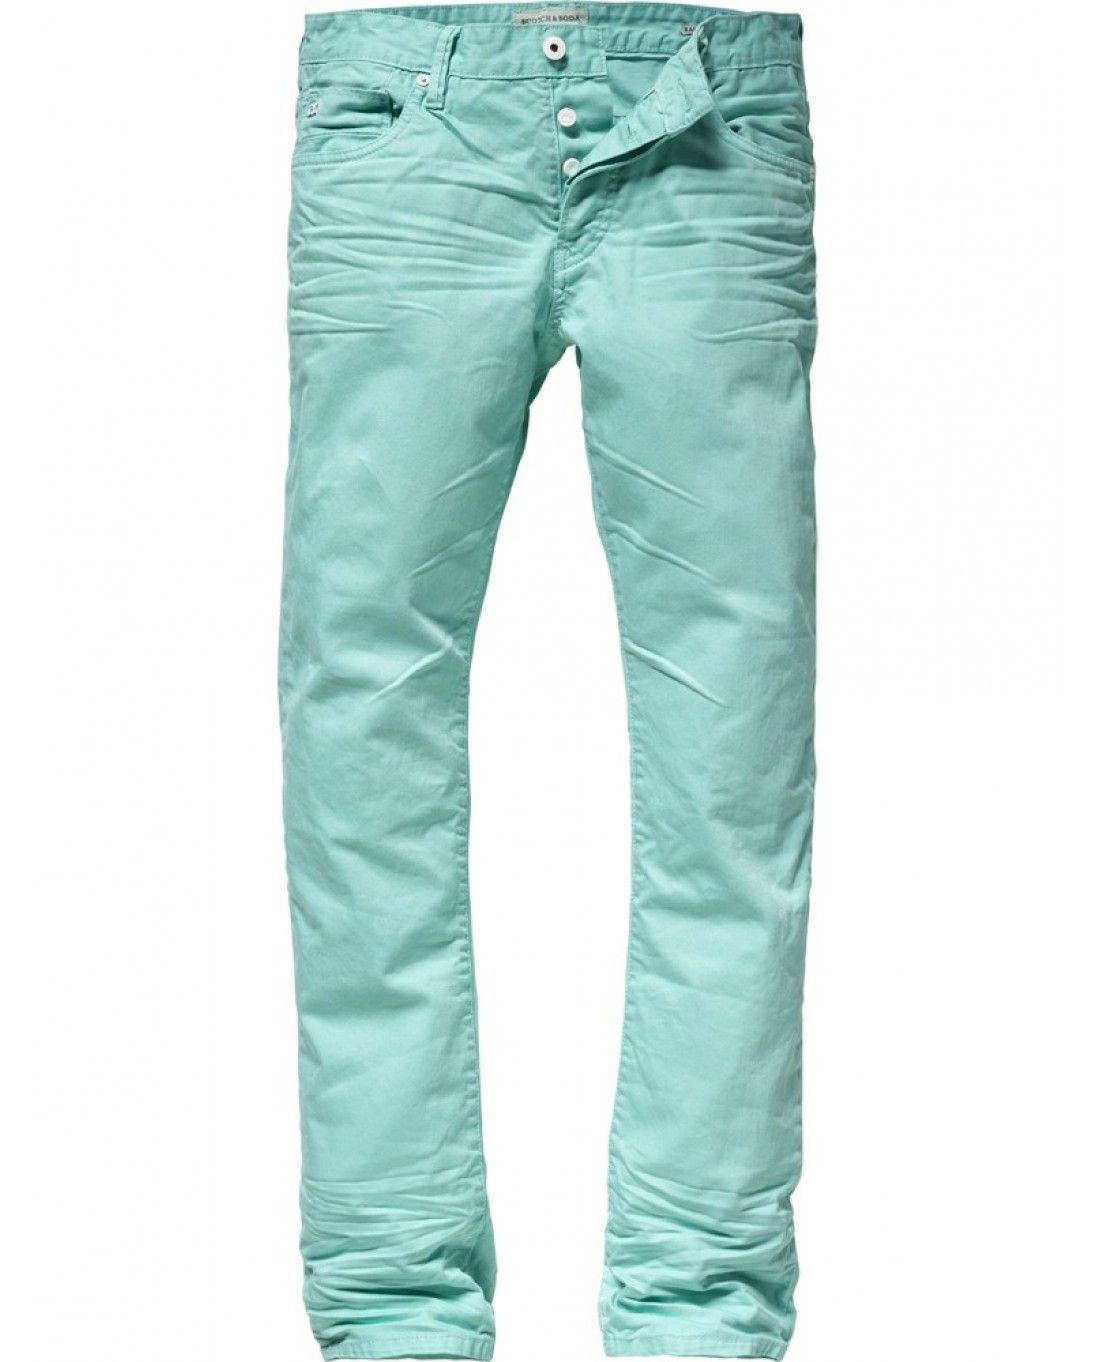 Mens Ralston-Garment Dye Colours Straight Jeans Scotch & Soda OeTi4J